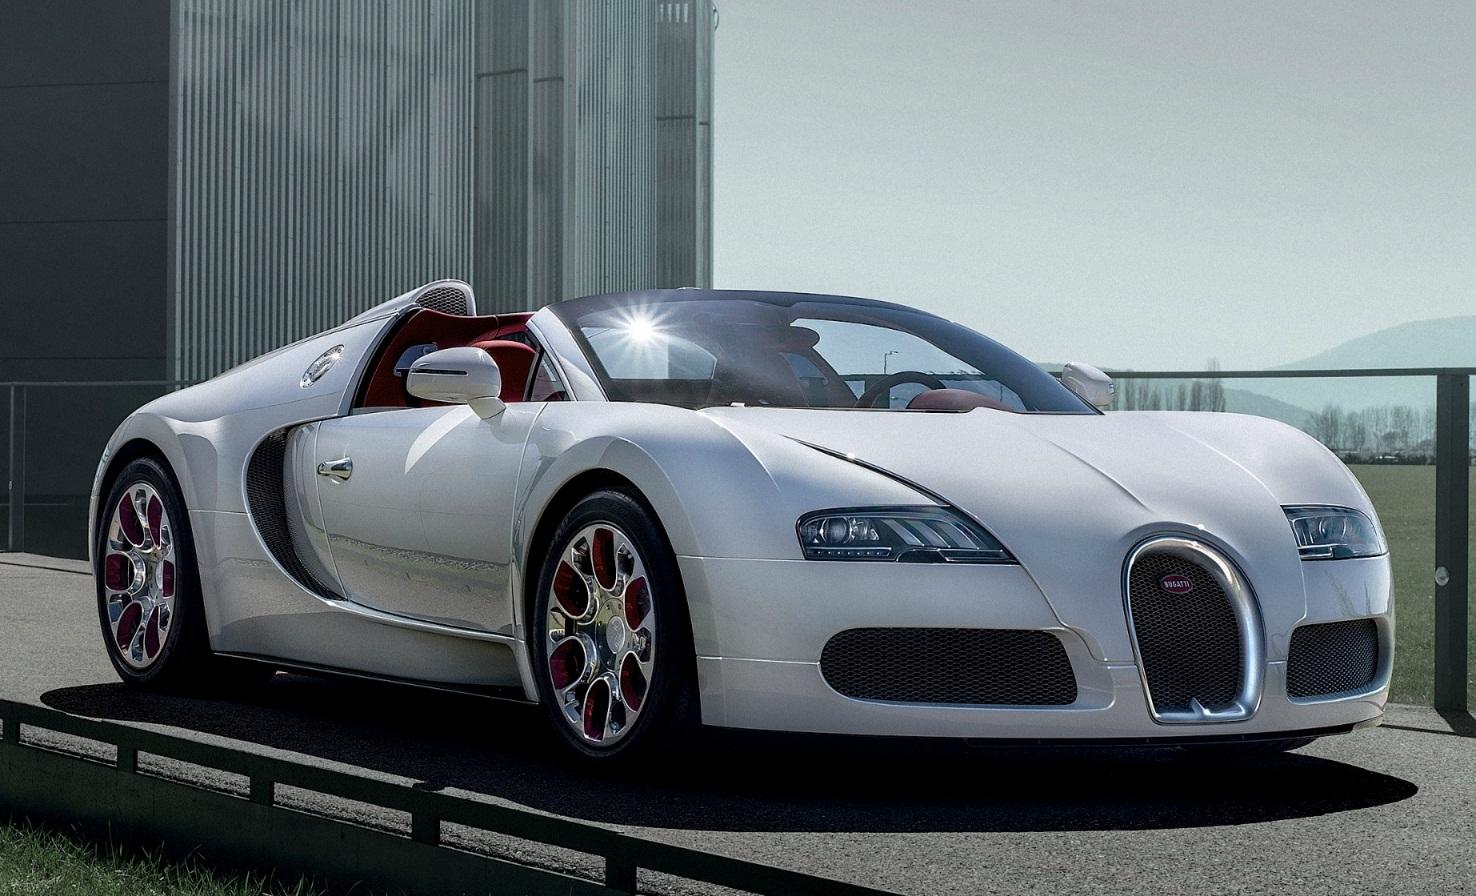 Sport Car Garage: Bugatti Veyron Grand Sport Wei Long (2012